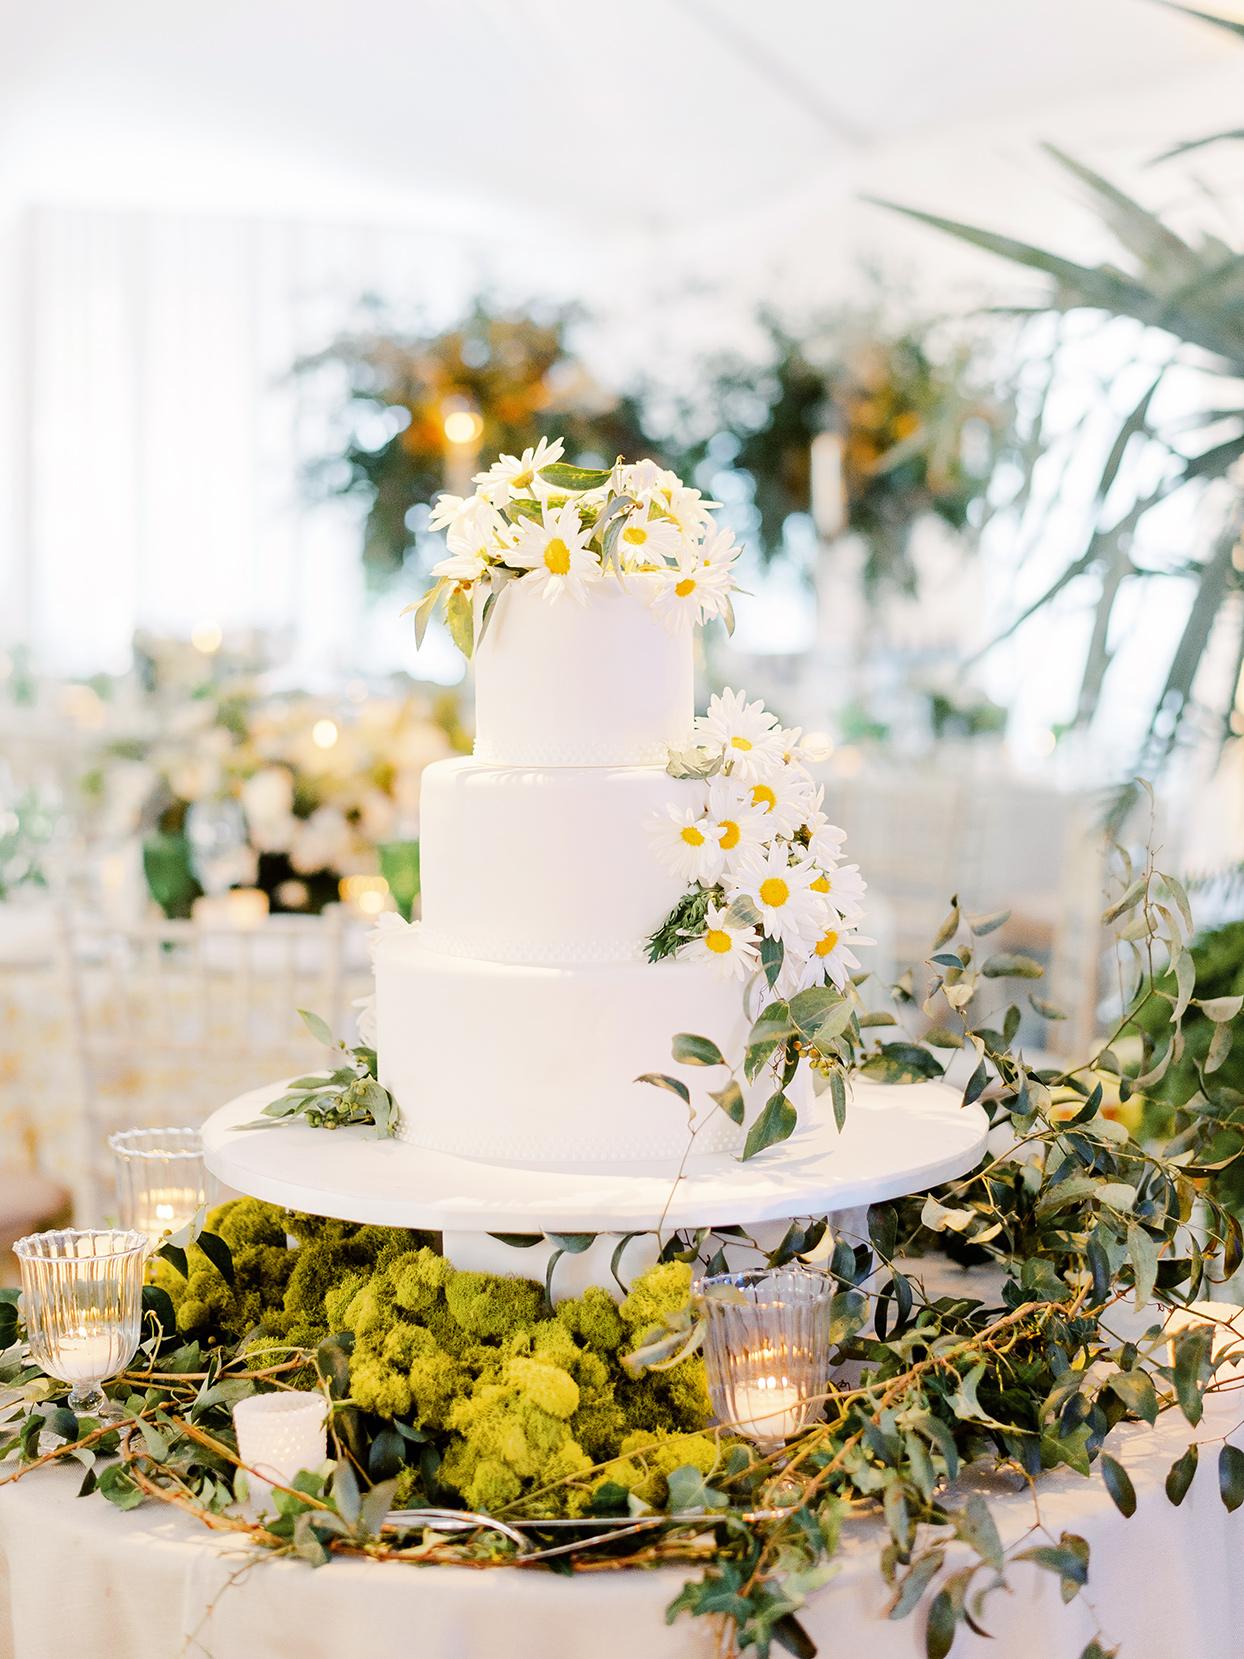 sofia alberto wedding cake on table